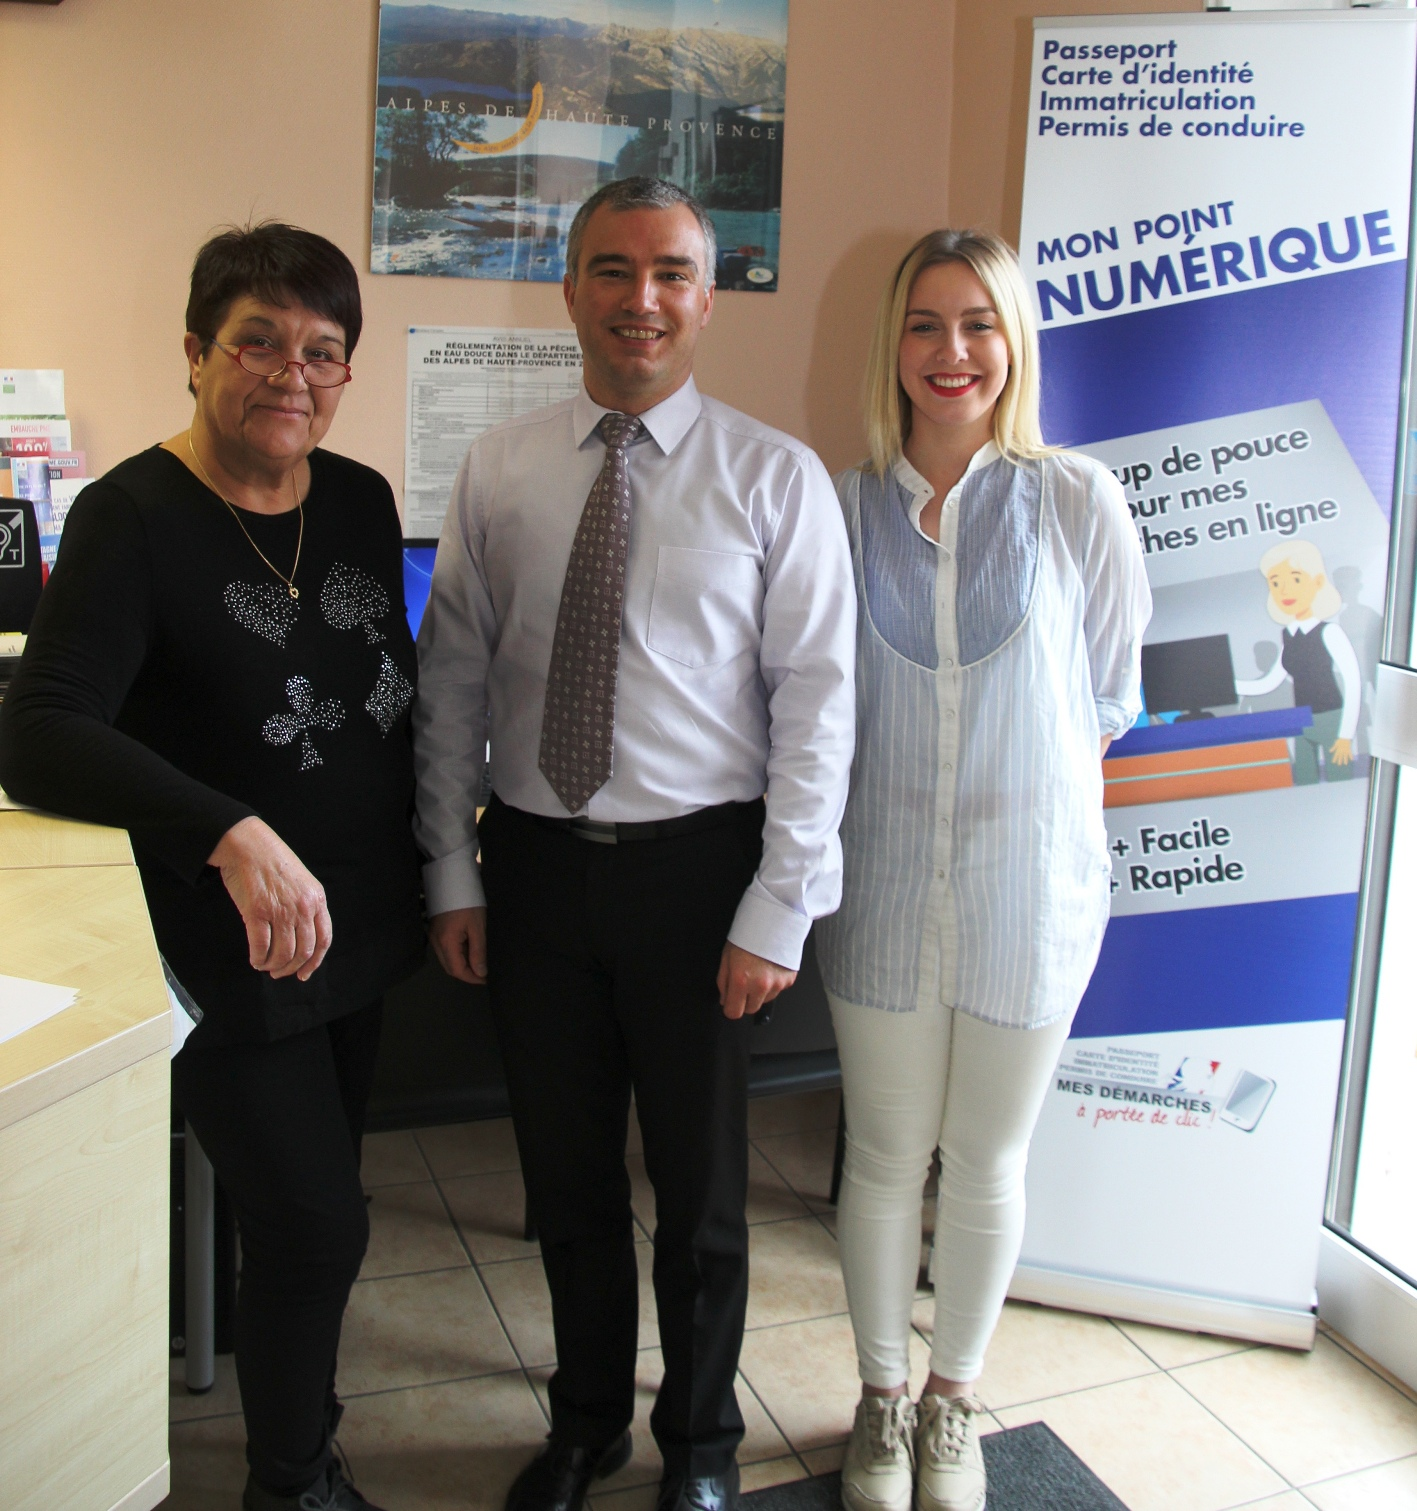 Joëlle Sereno, Christophe Duverne, Johanna Geffroy -  Photo Line Tilleman